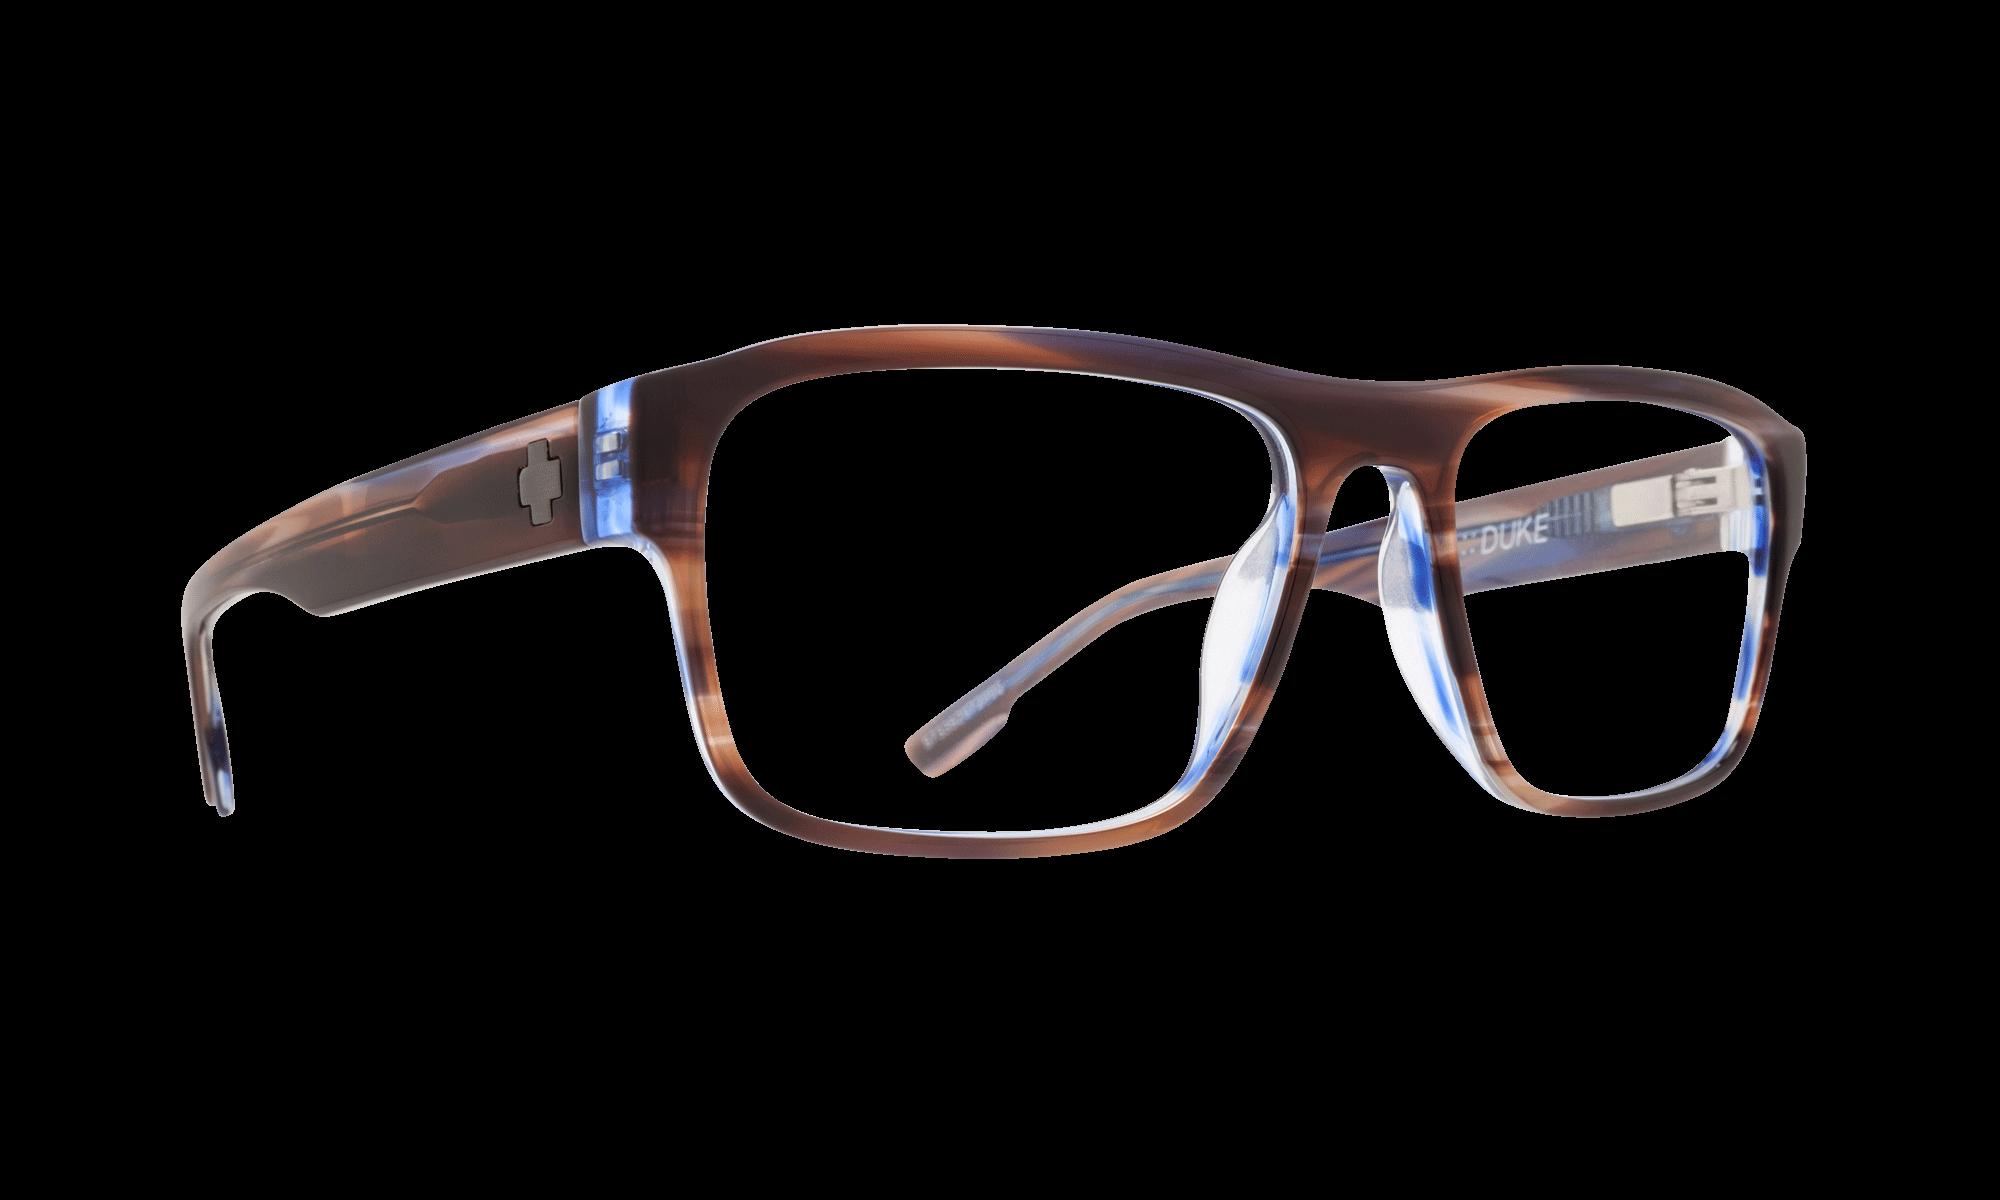 3f2fdc5d0ed5 Spy Optic Duke Eyeglasses FREE S H 573352072000